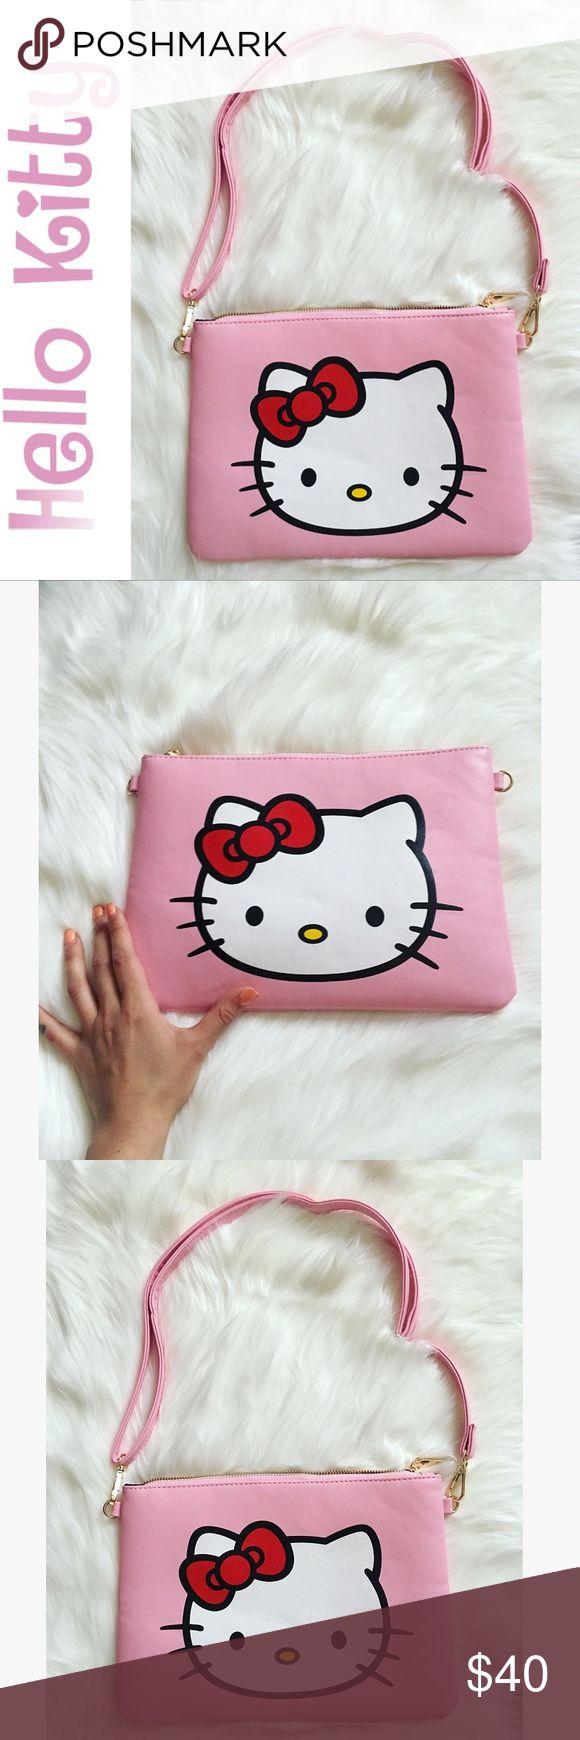 Hello Kitty Pink Crossbody/Shoulder/Clutch Bag 💕 Hello Kitty Pink Crossbody/ Shoulder/ Clutch Purse 💕 Hello Kitty Bags Crossbody Bags